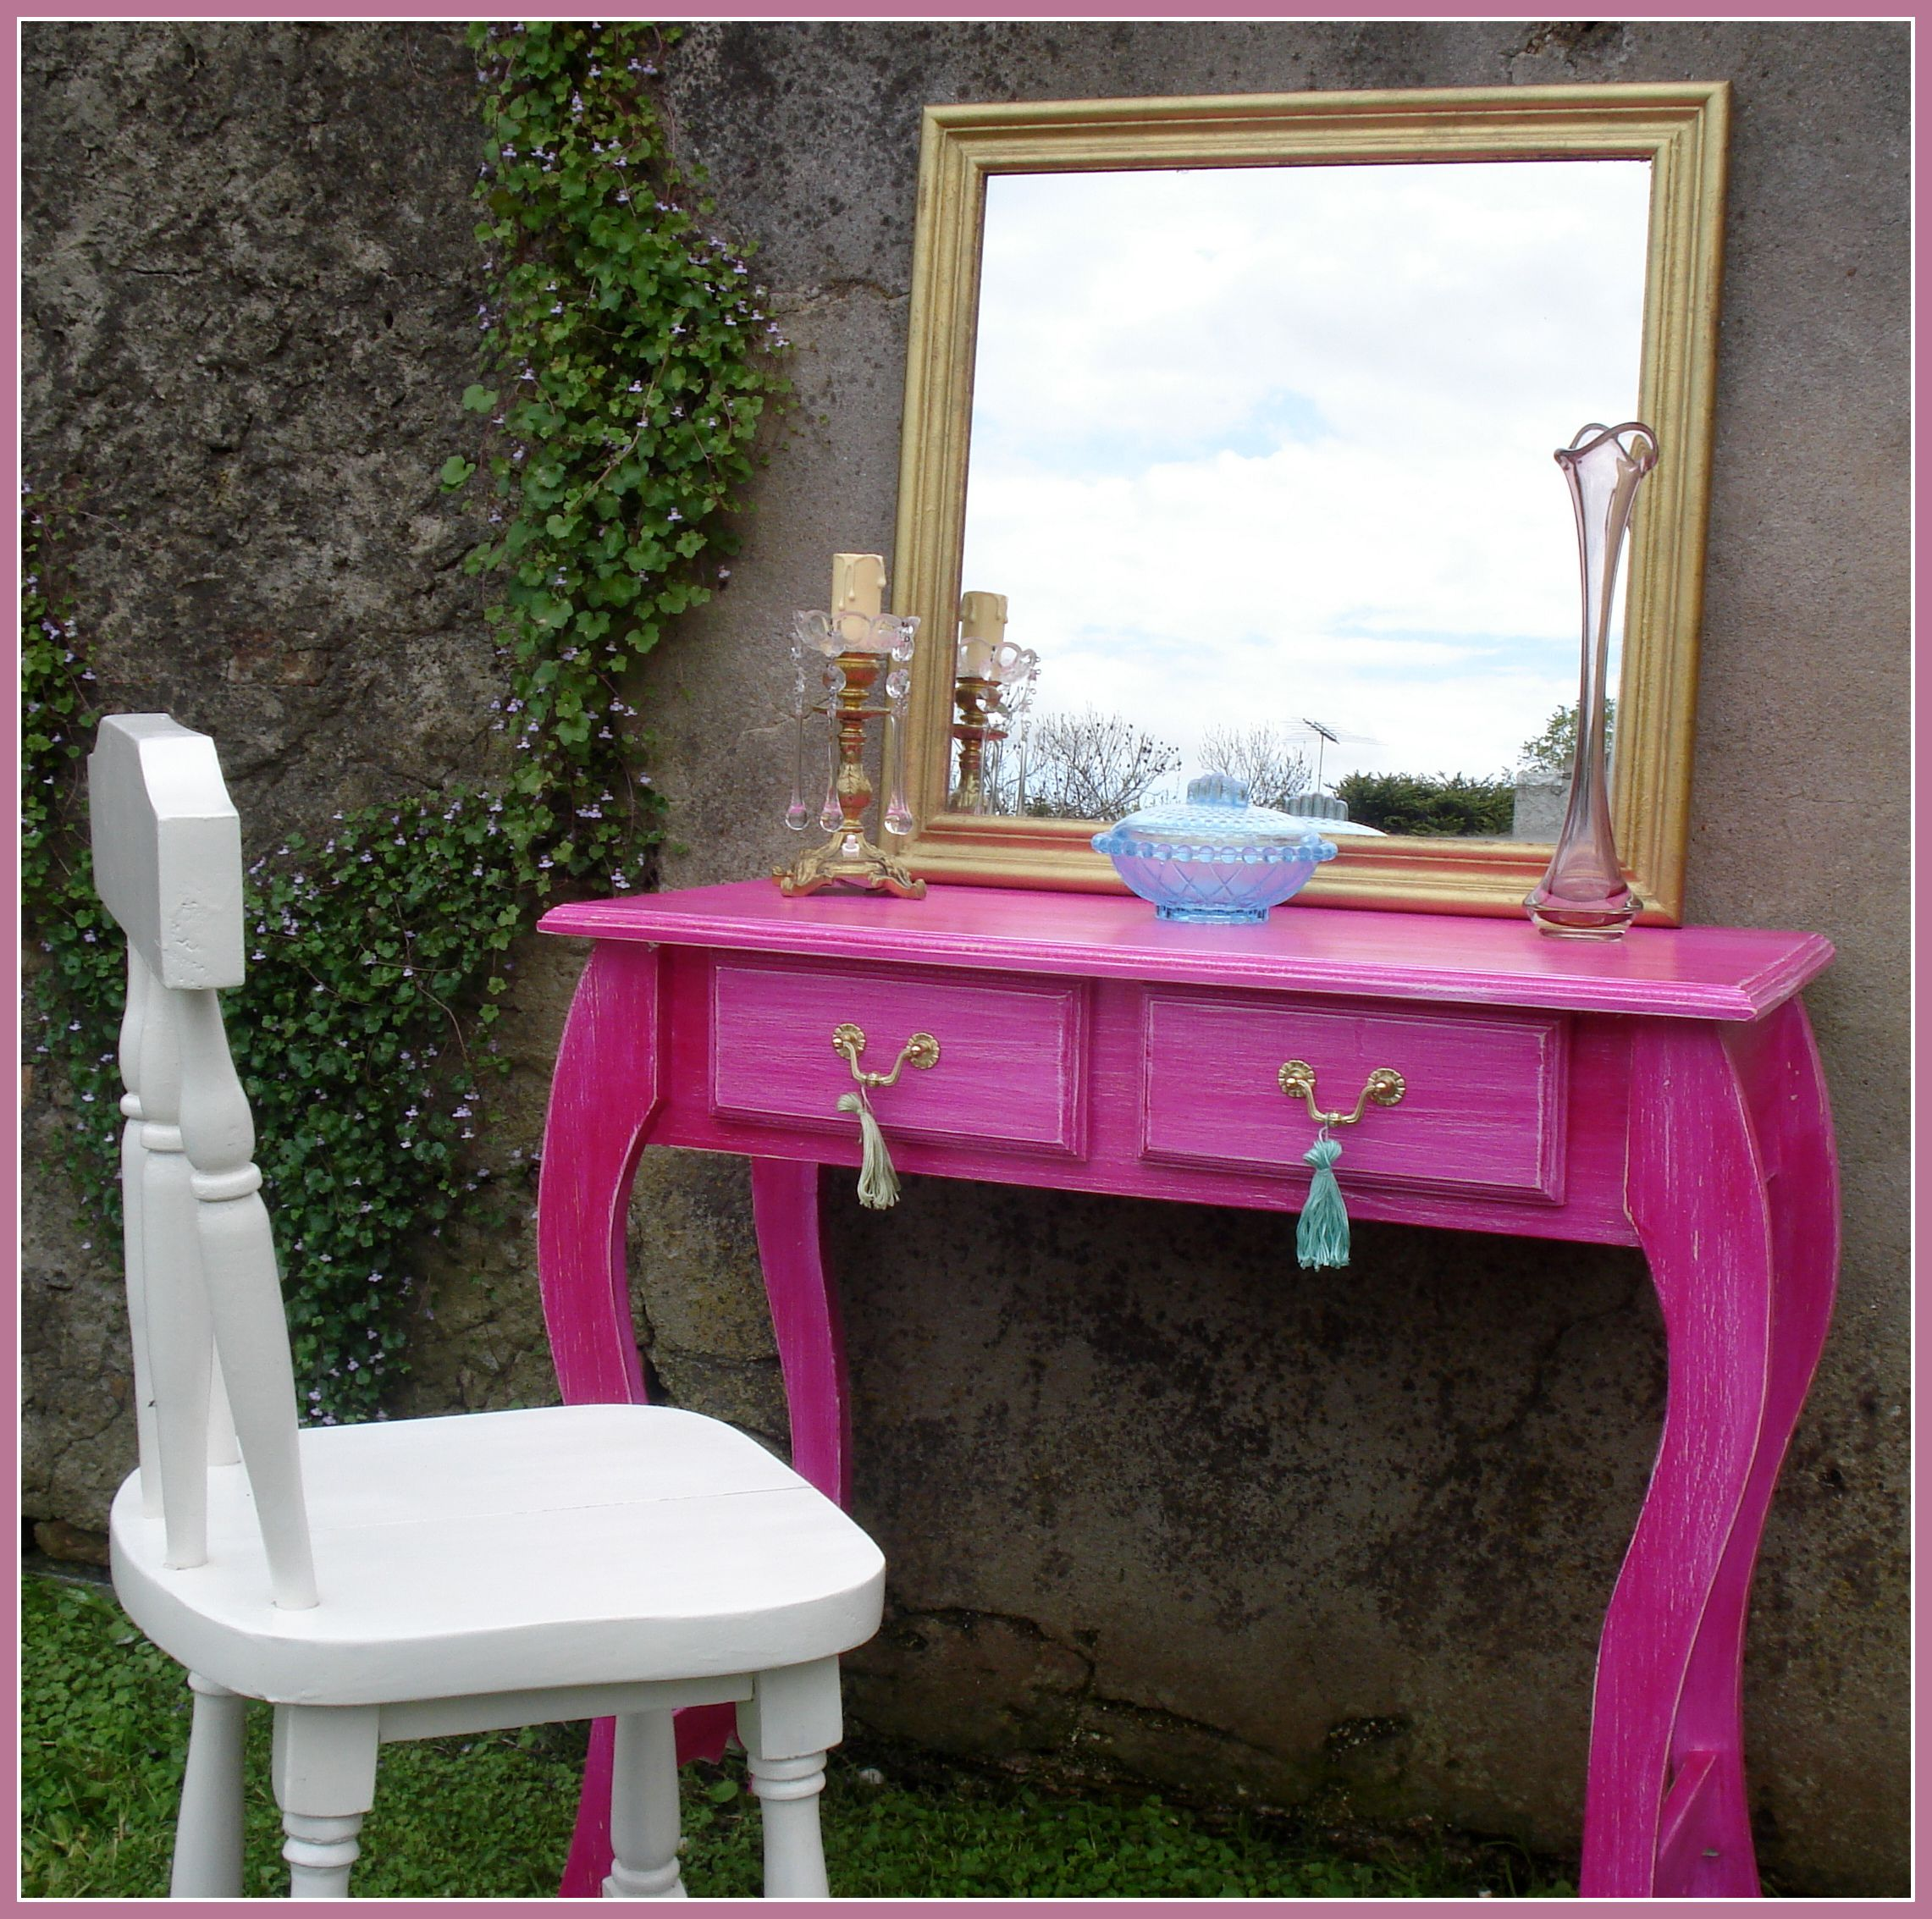 Escritorio Recibidor Mesa Auxiliar Decapado En Fucsia Ideal  # Muebles Color Fucsia